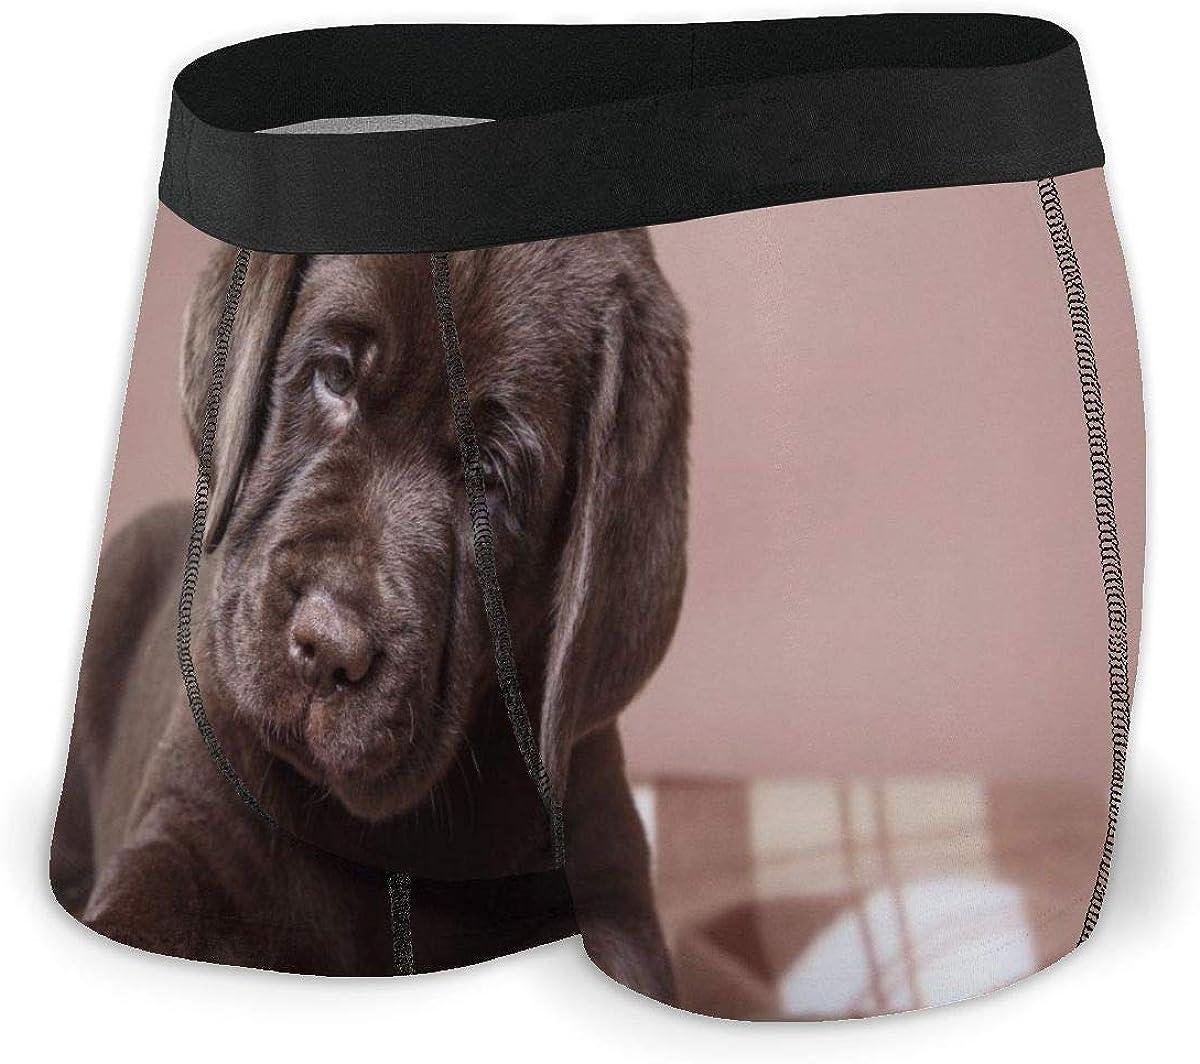 Randolph Wordsworth Mens Boxer Briefs Marvellous Brown Labrador Dog Puppy Boys Trunks Underwear Short Leg Breathable Man